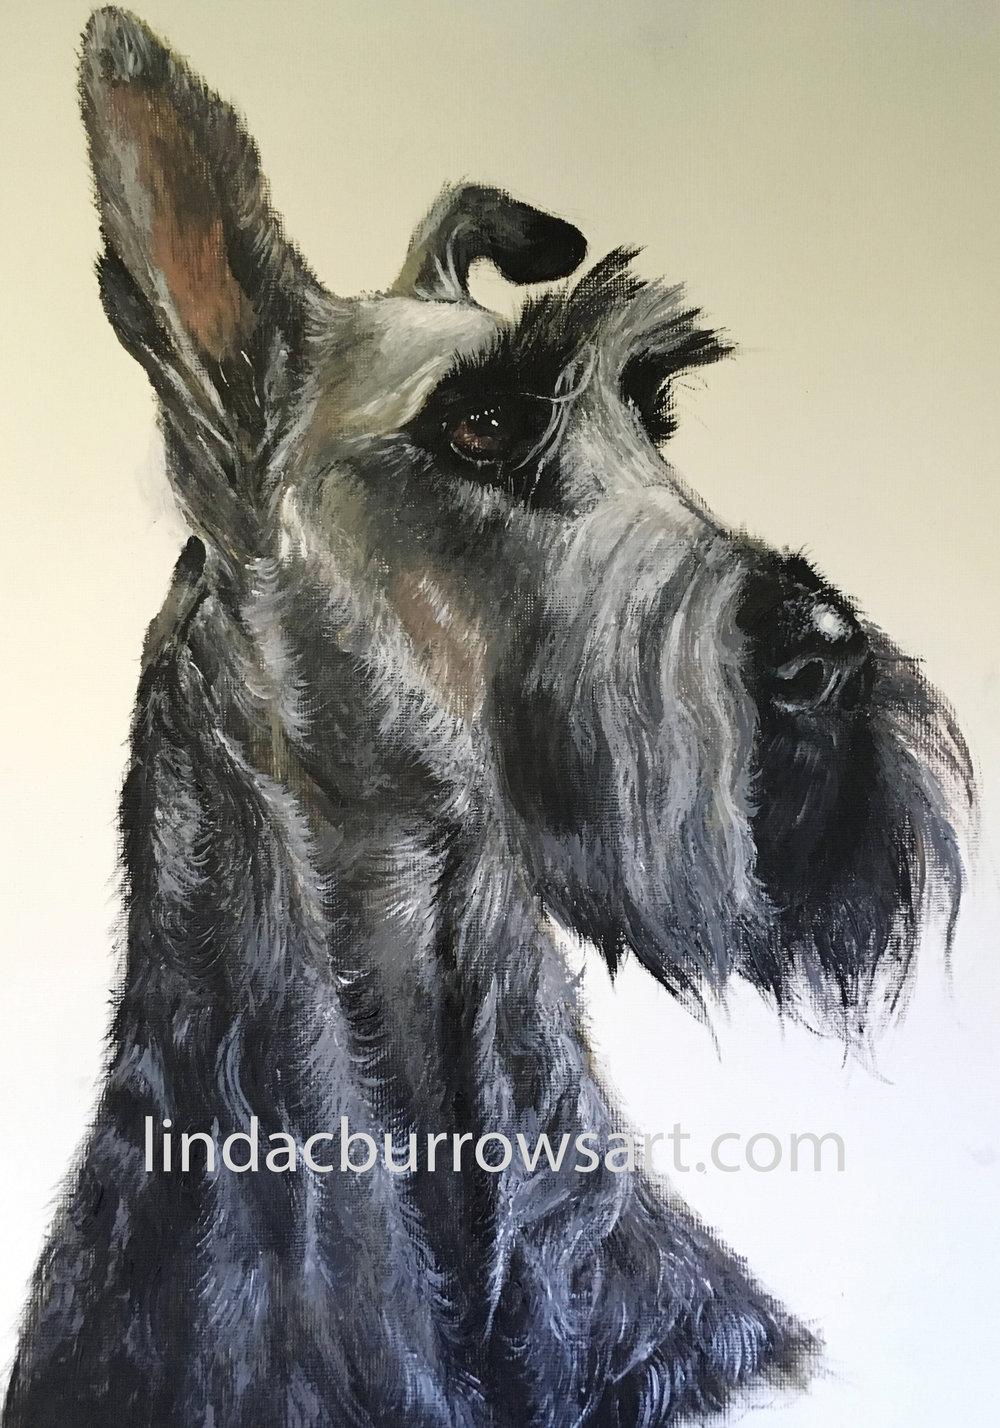 Rufus, 2018. Acrylic on canvas